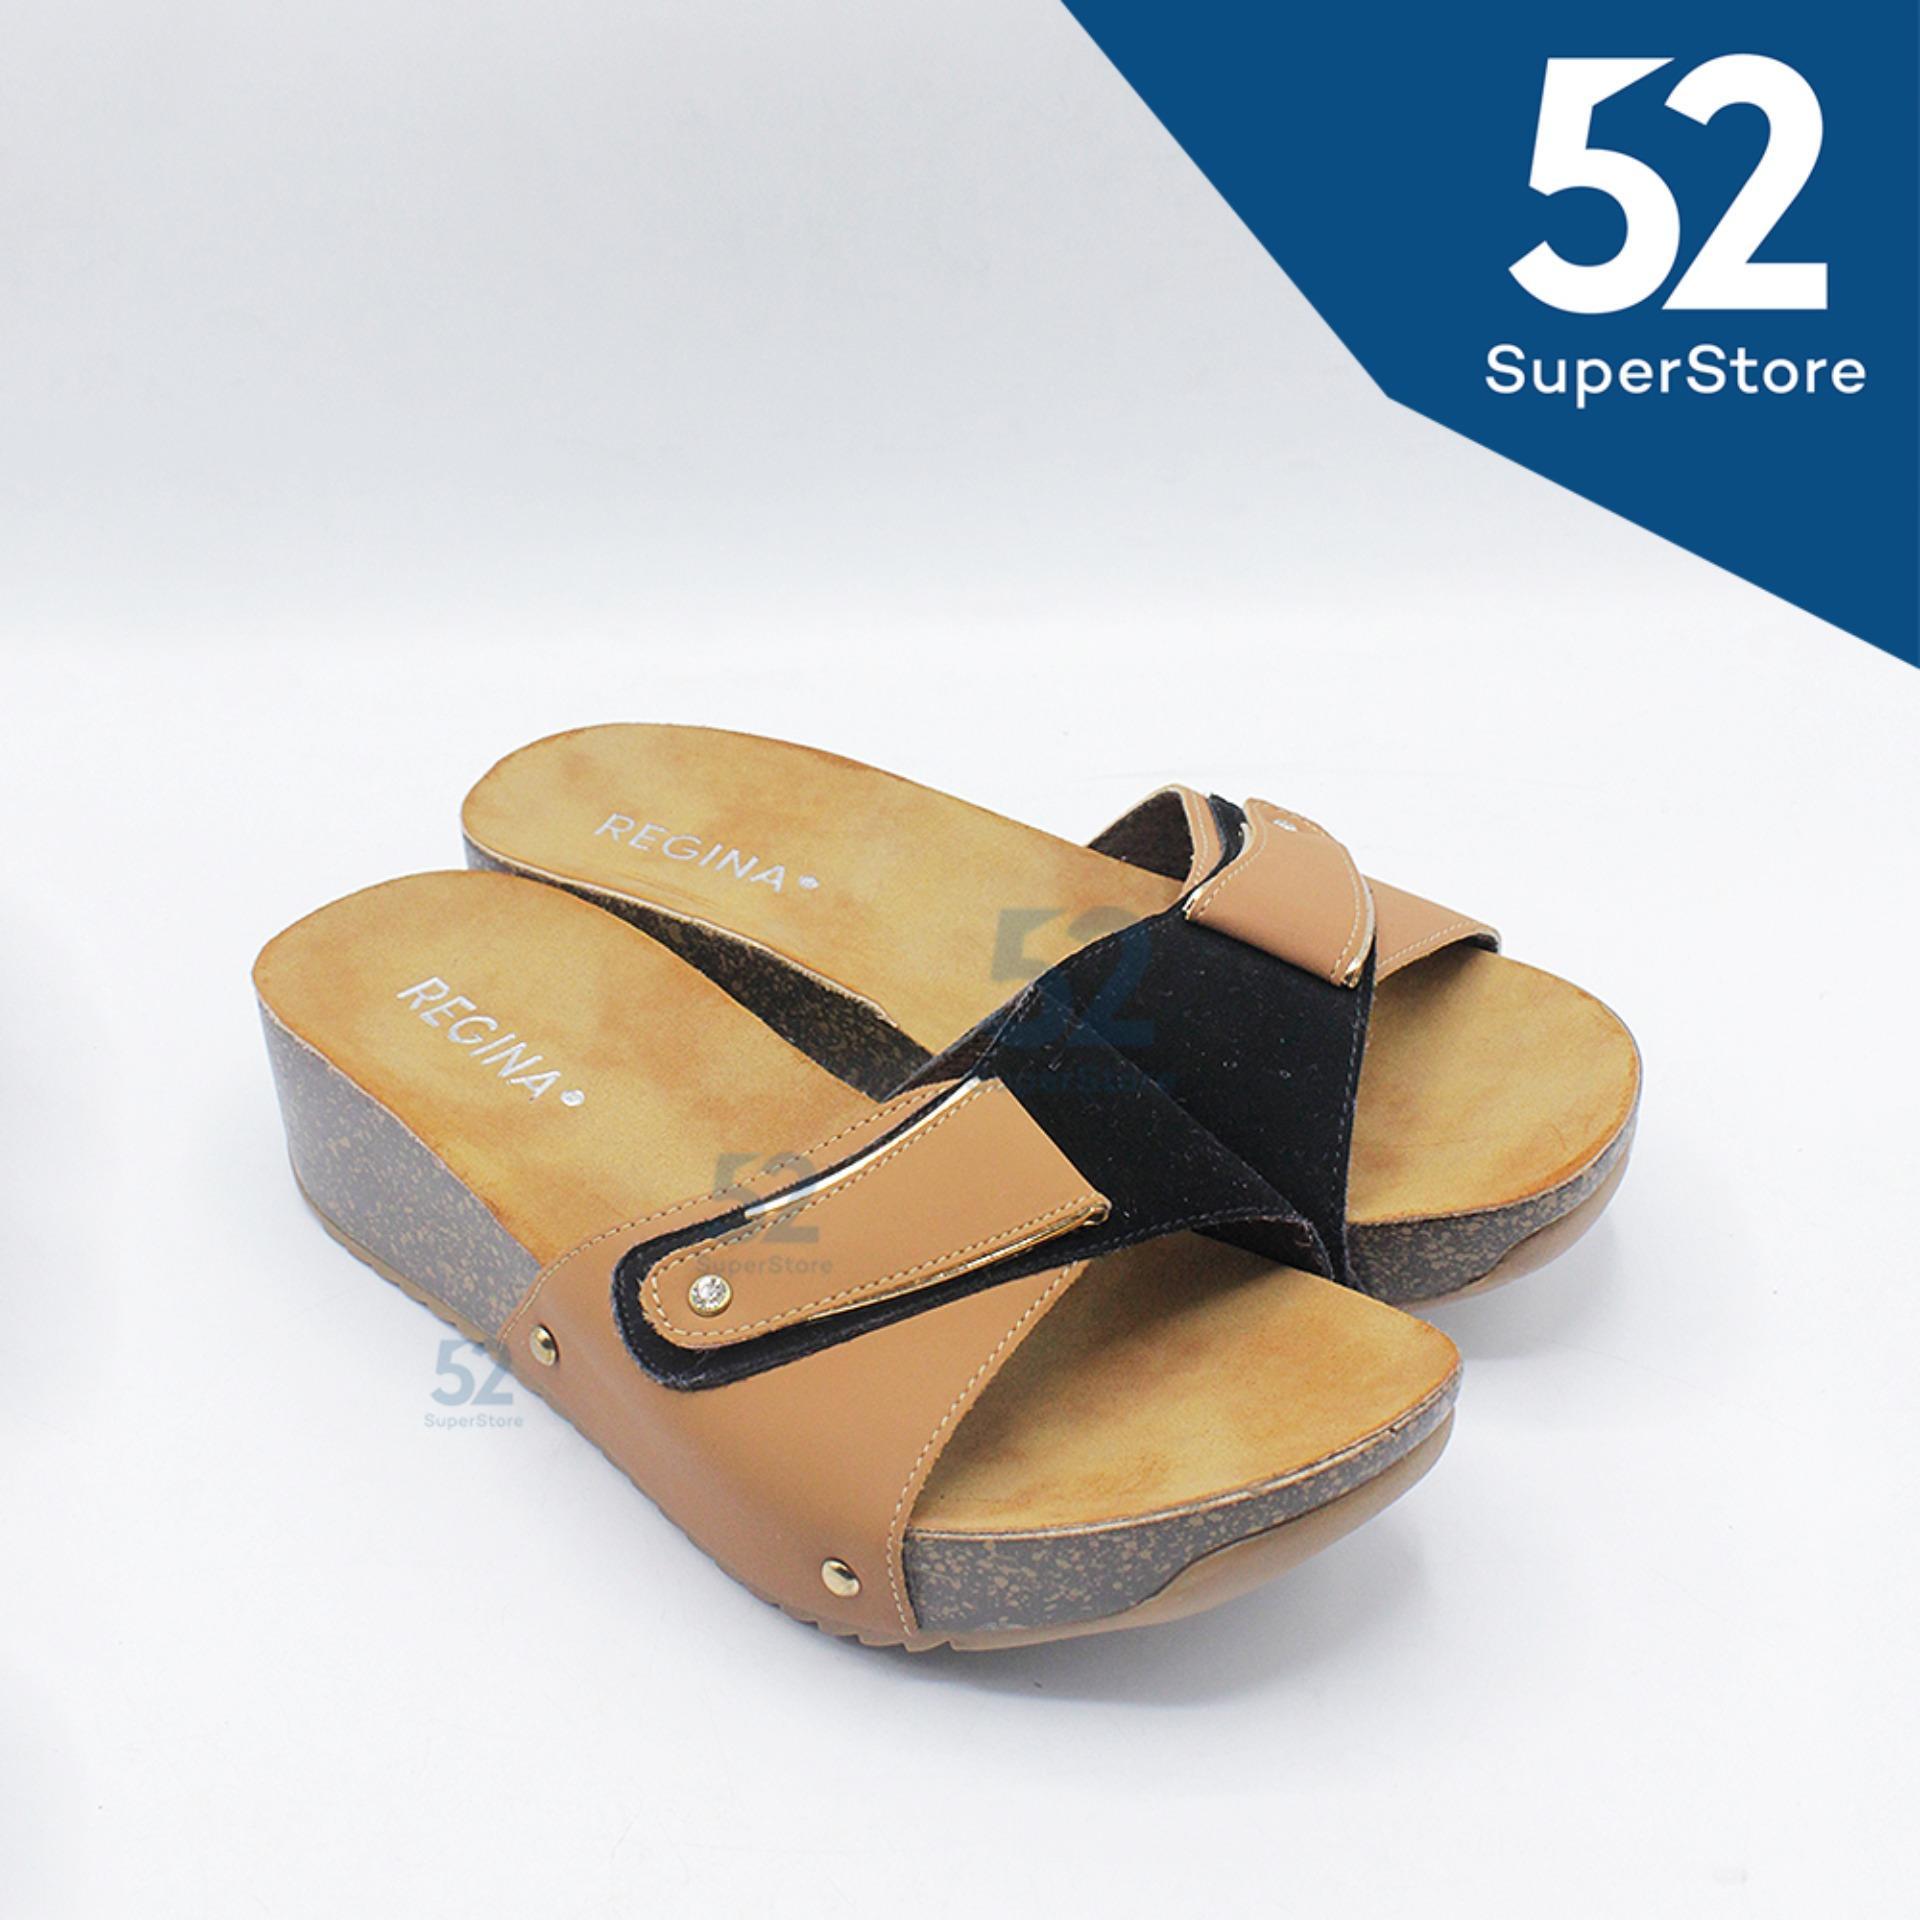 Regina Sandal Wedges Wanita 1704-002 - Black/Camel Size 36-40 HAK 5 cm